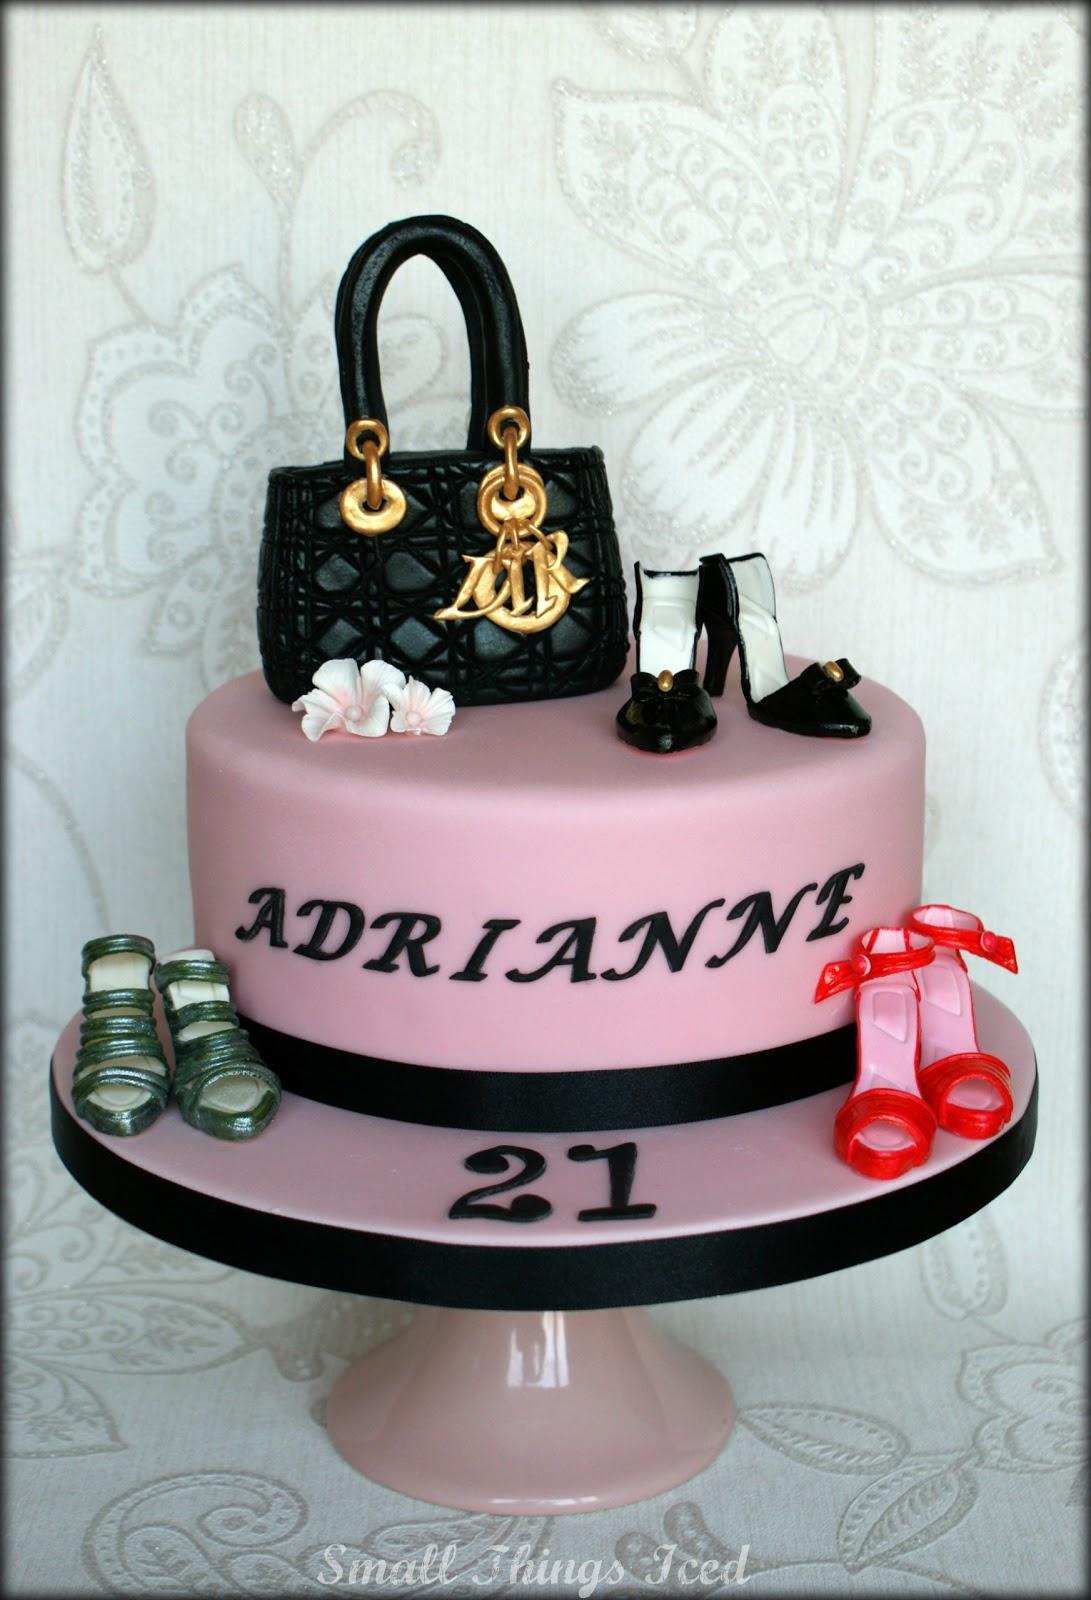 10 Birthday Cakes Of Shoes And Handbags Photo Handbag And Shoes